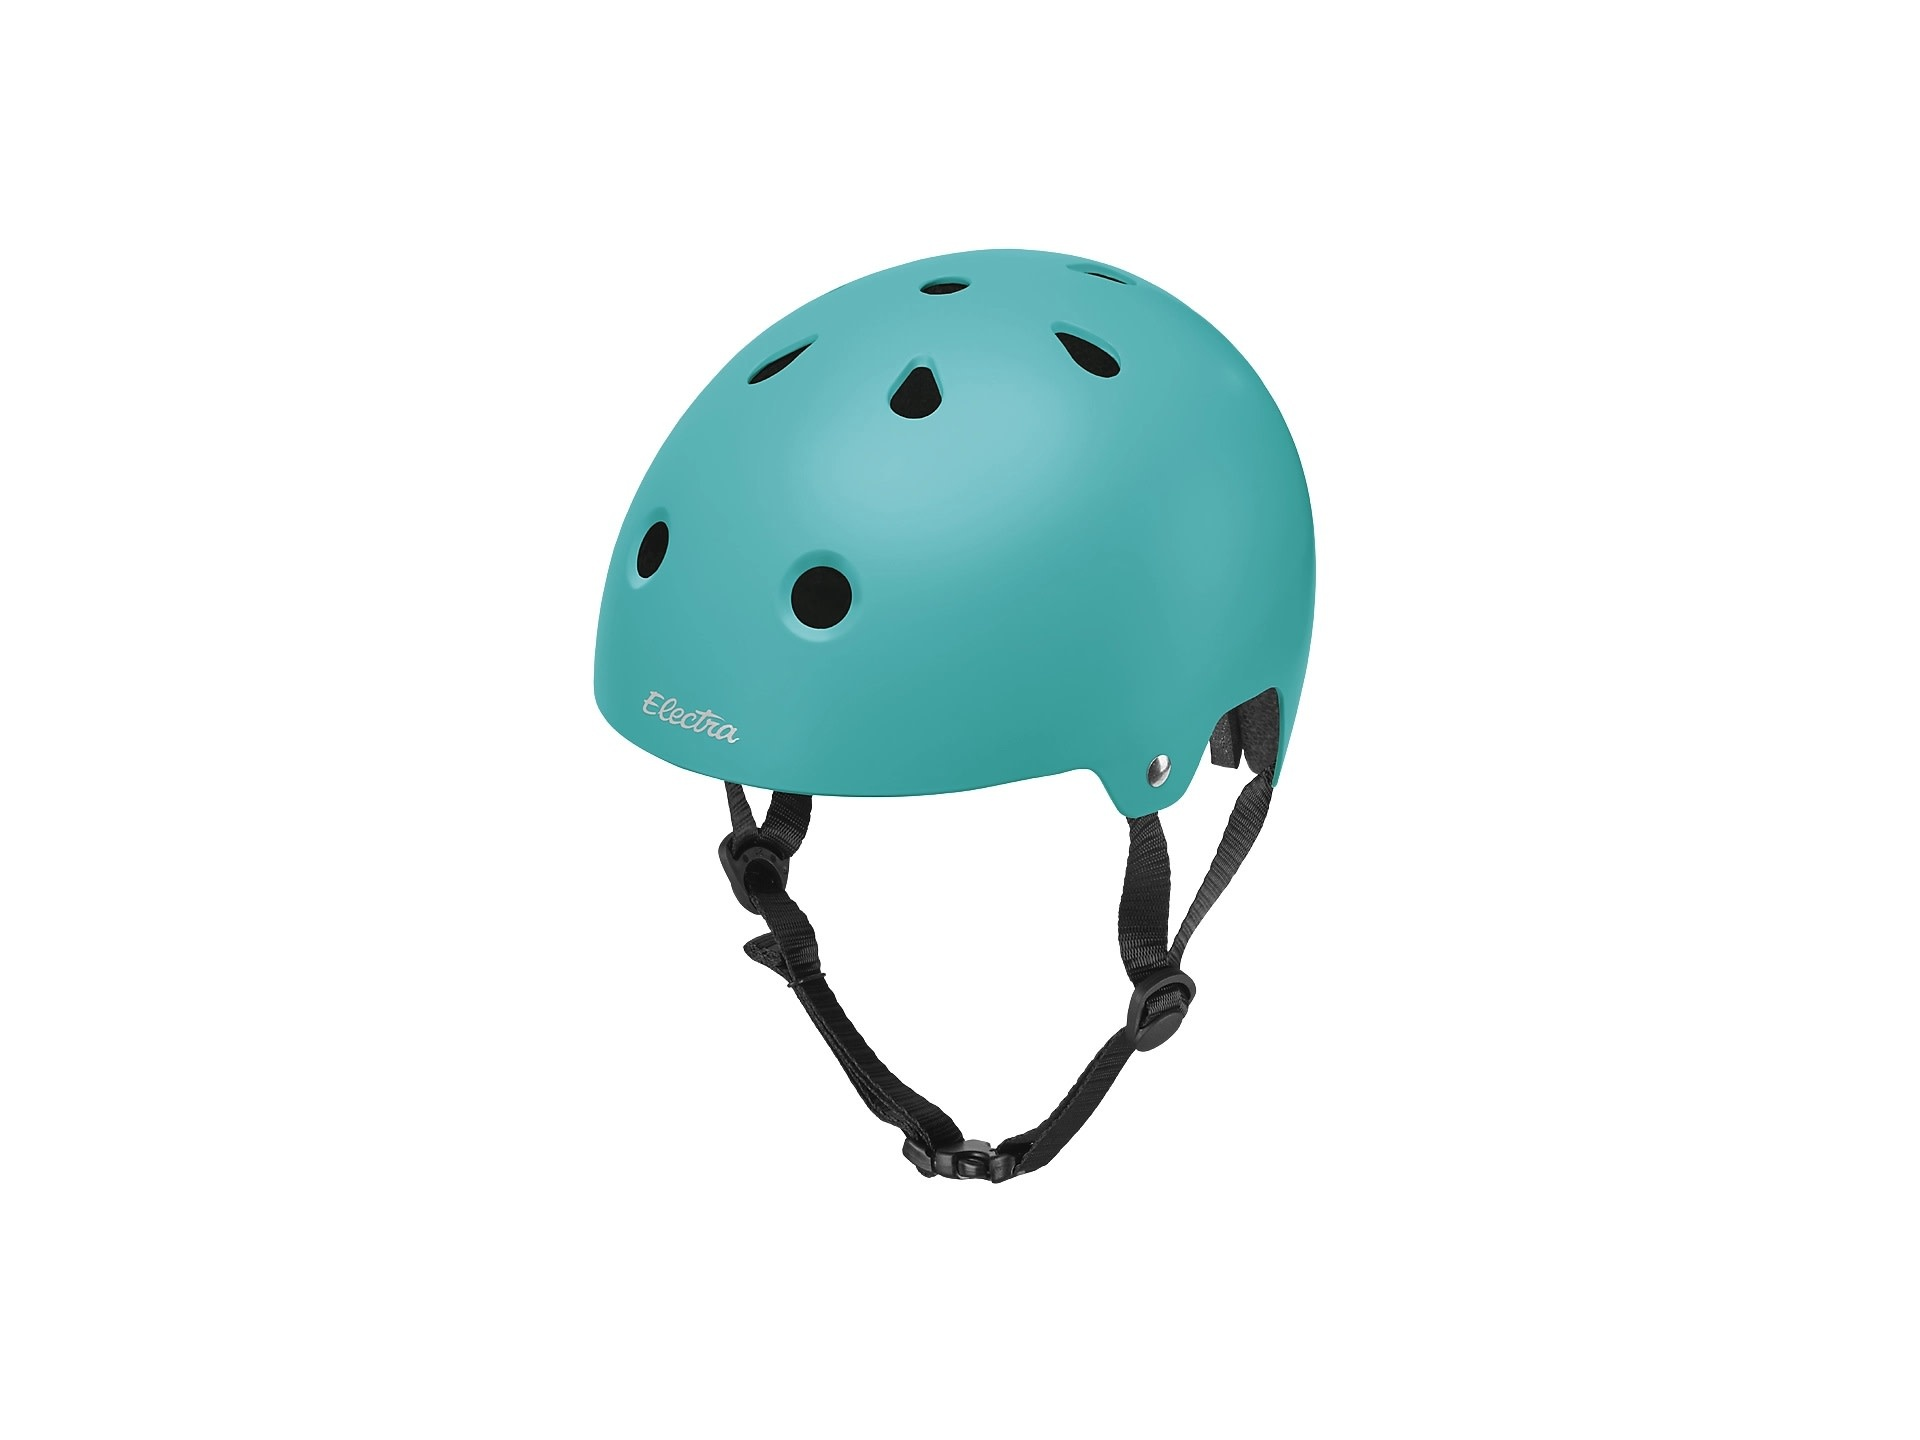 Electra Electra Helmet Lifestyle Teal